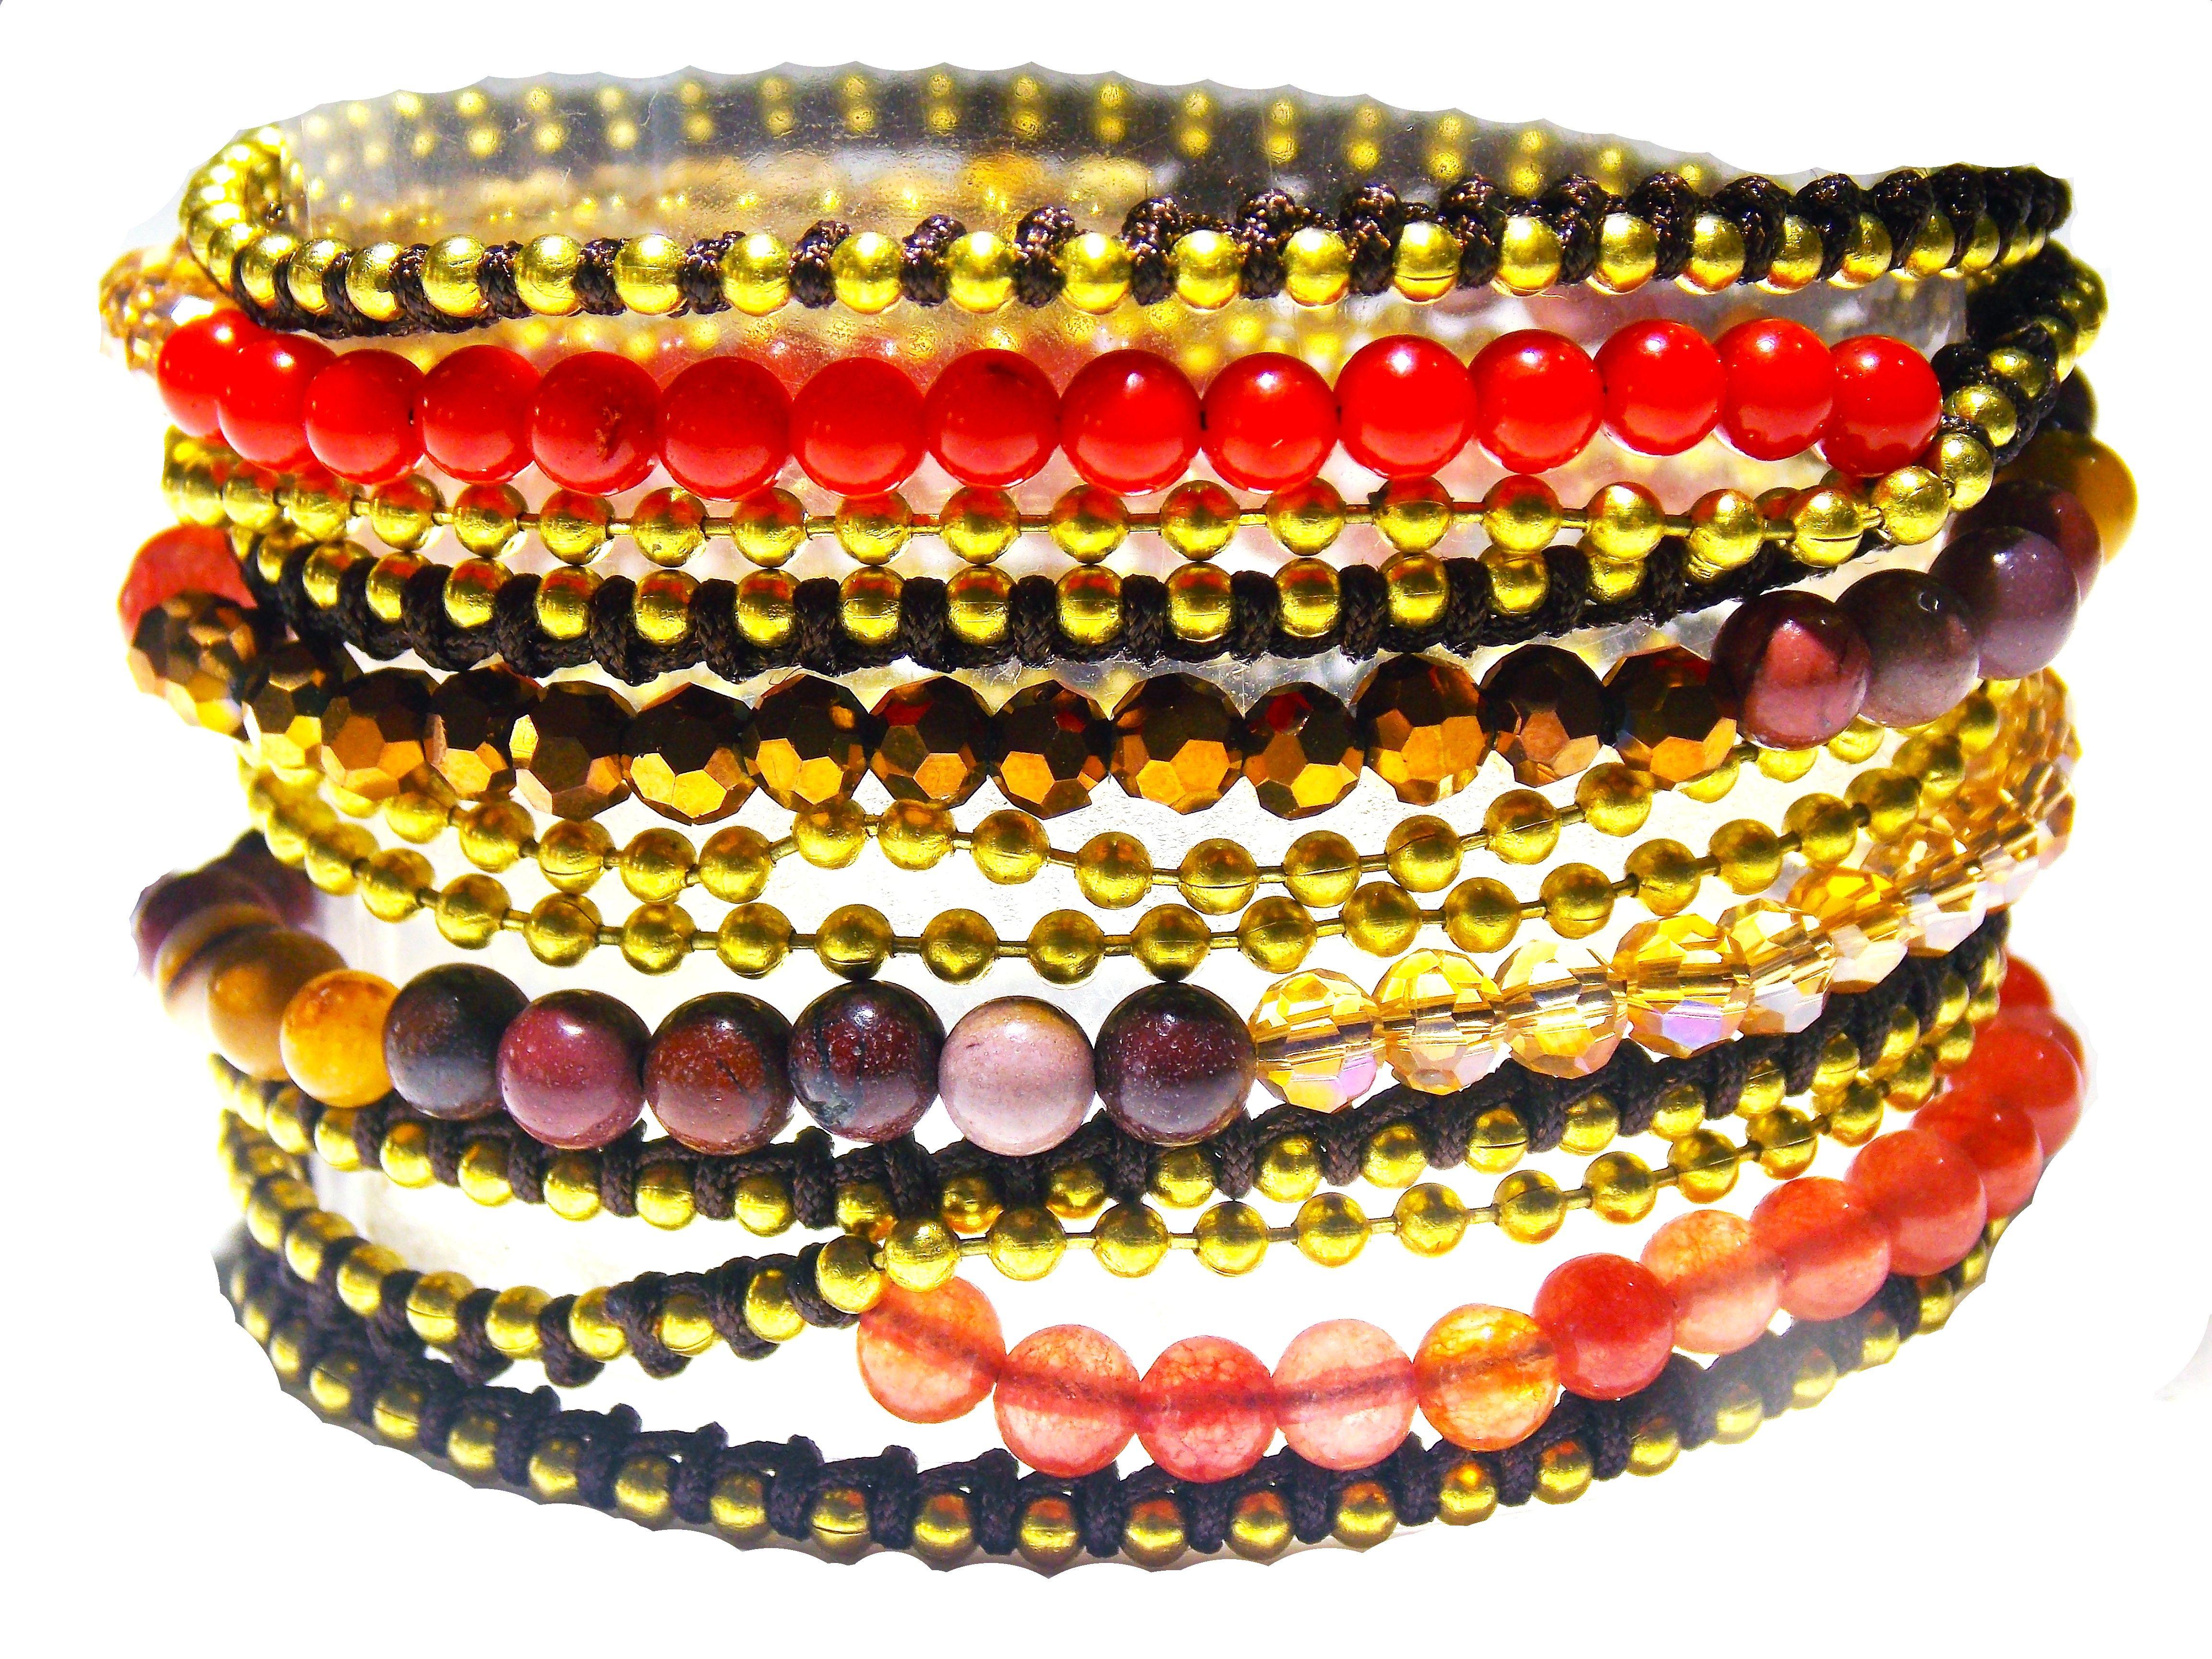 2 in 1 – Cornelian & Aventurine Bracelet/Necklace